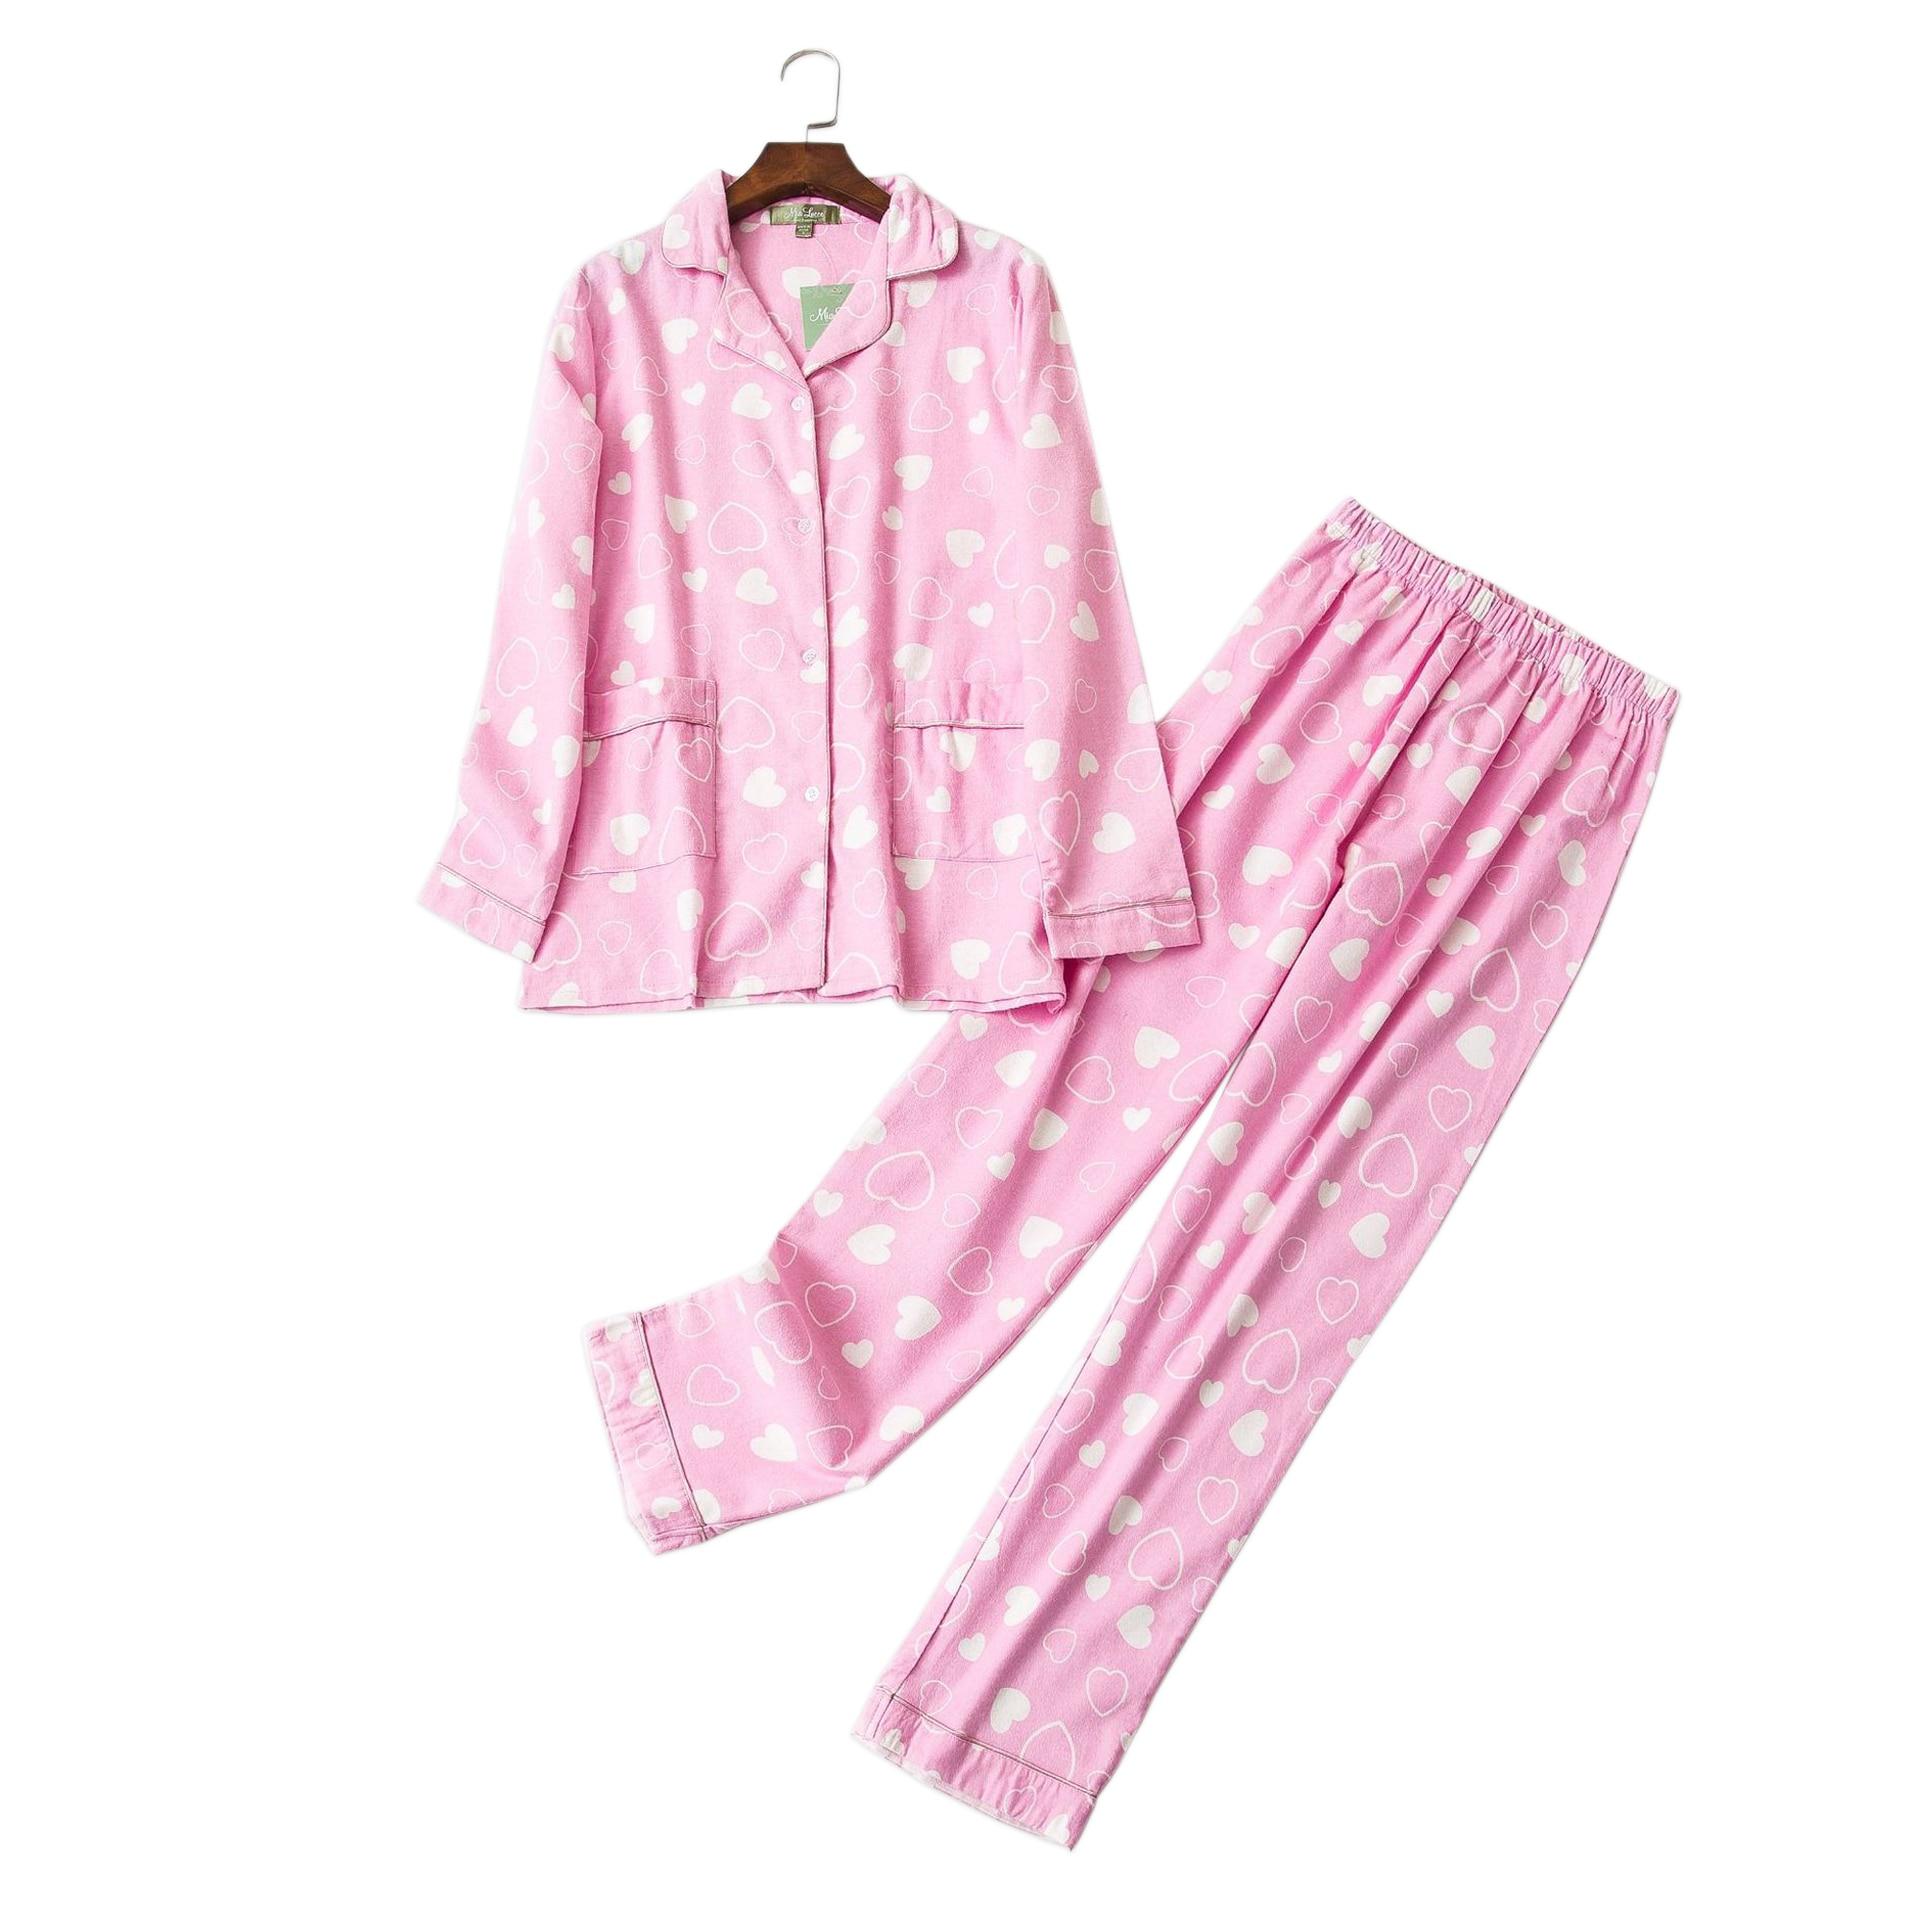 Cute Pink heart 100% cotton   pajama     sets   women lovely long sleeve sexy pijamas mujer winter brushed cotton warm home sleepwear